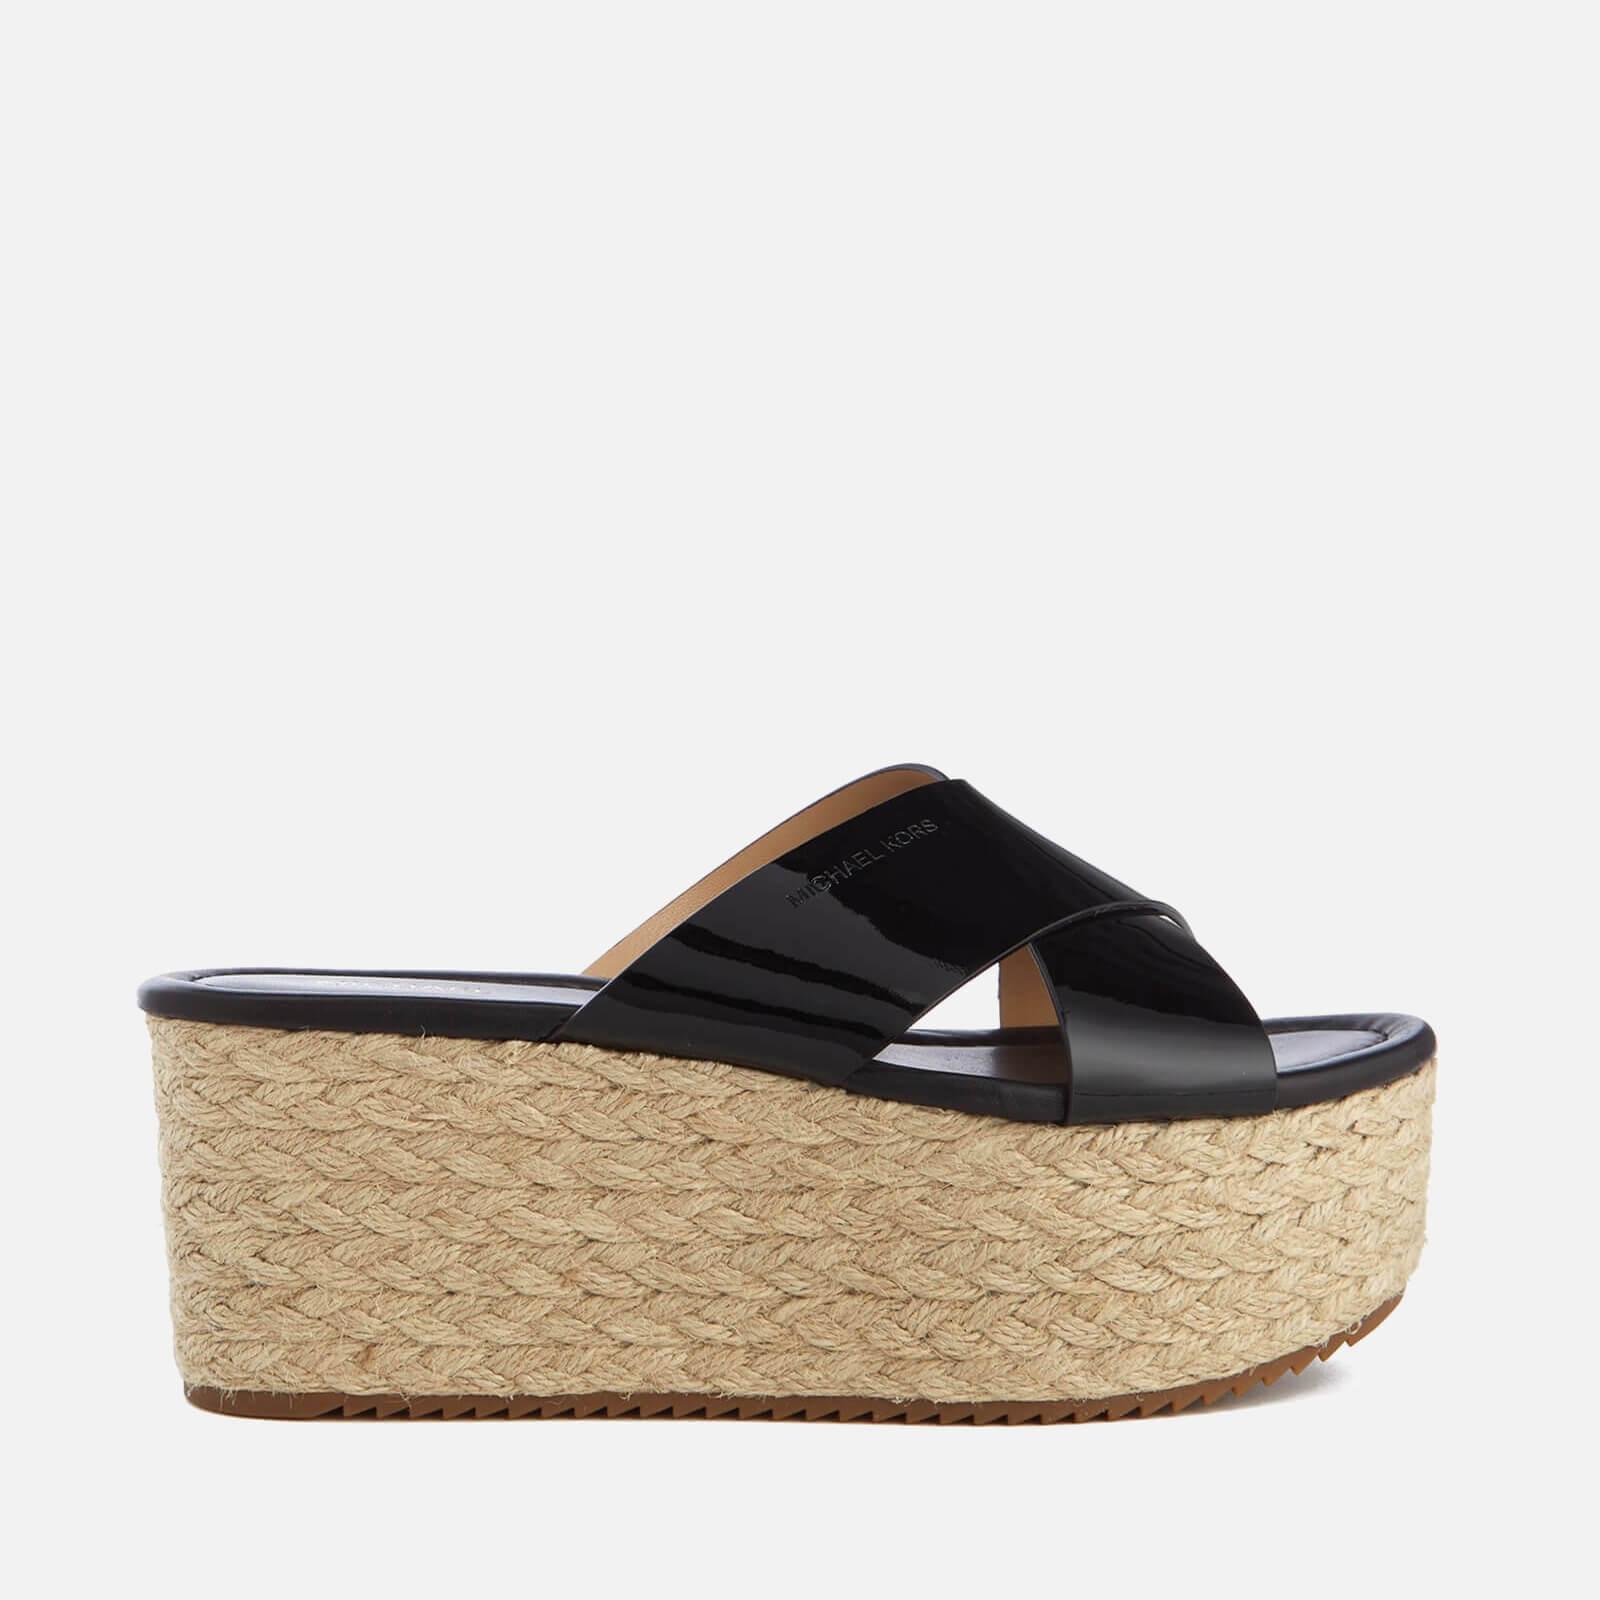 Black mk sandals - Michael Michael Kors Women S Vivianna Slide Wedged Sandals Black Patent